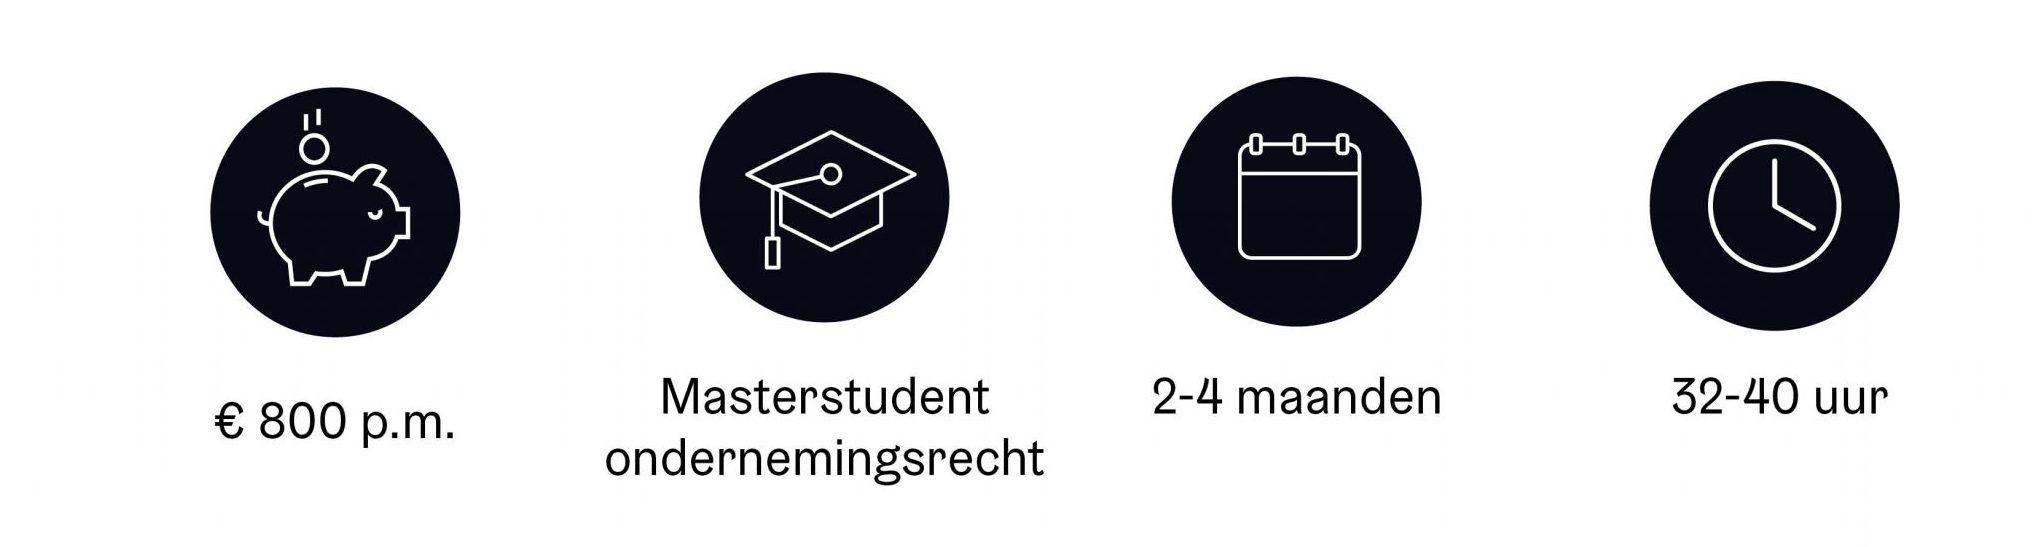 Student stagiaire ondernemingsrecht